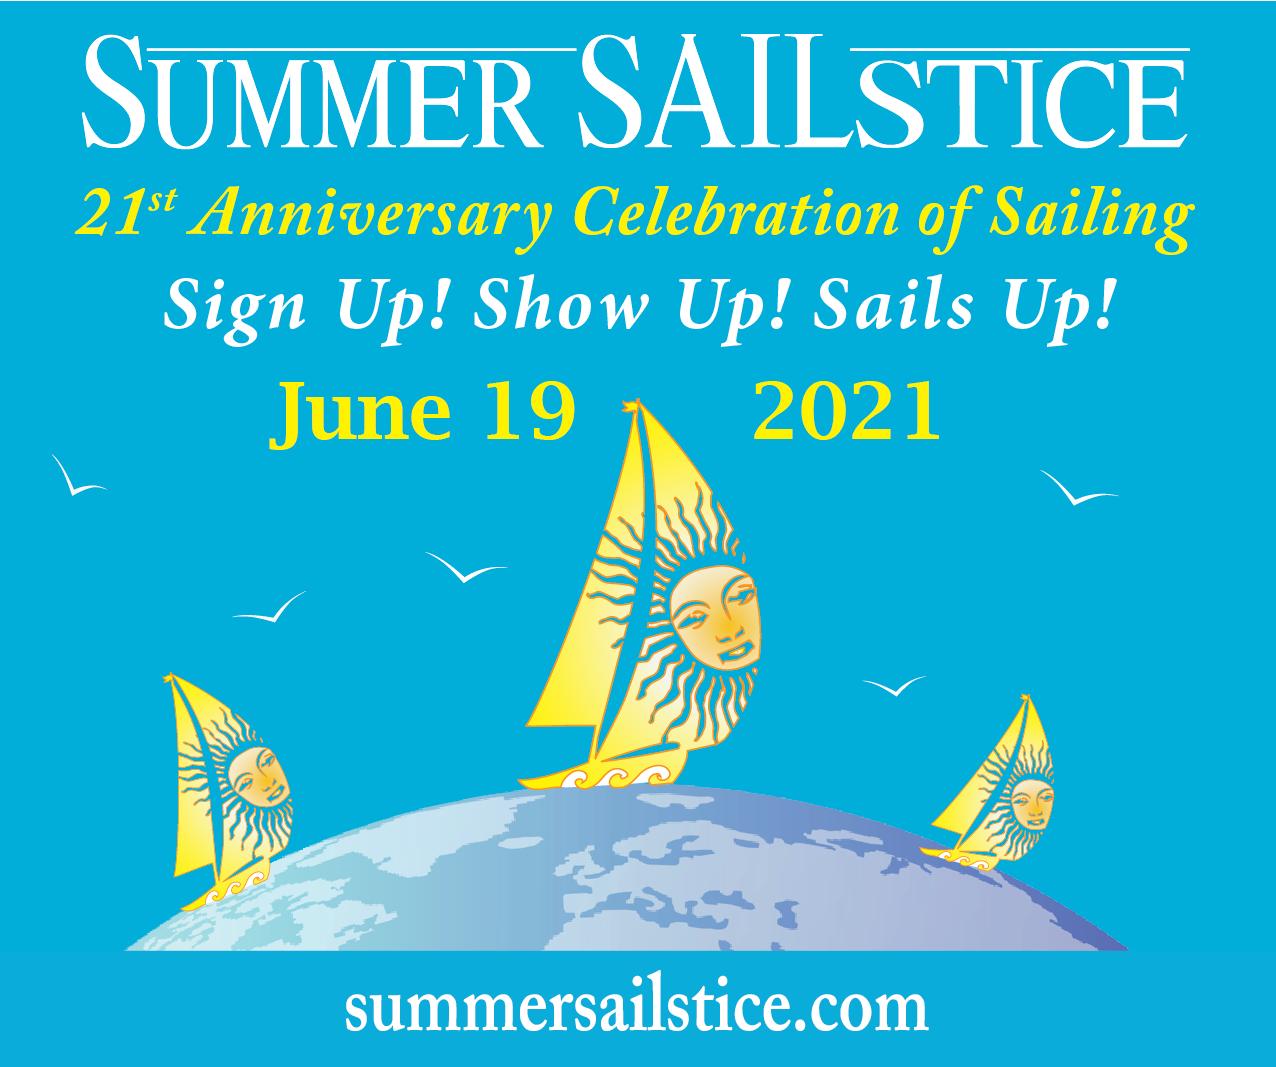 Summer Sailstice 2021